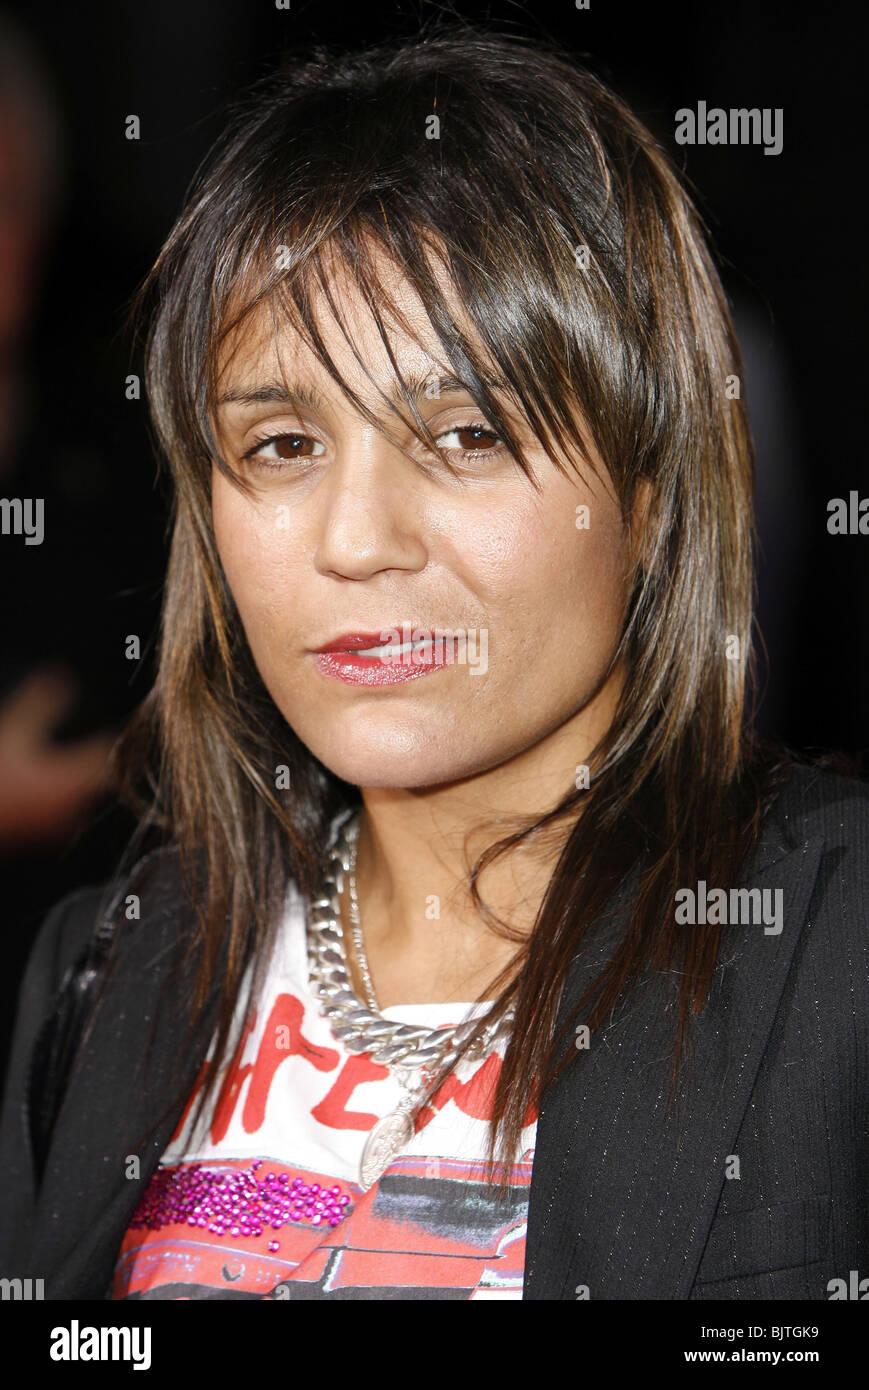 AMANDA GHOST VODAFONE LIVE MUSIC AWARDS ROUNDHOUSE CAMDEN LONDON 11 October 2006 - Stock Image